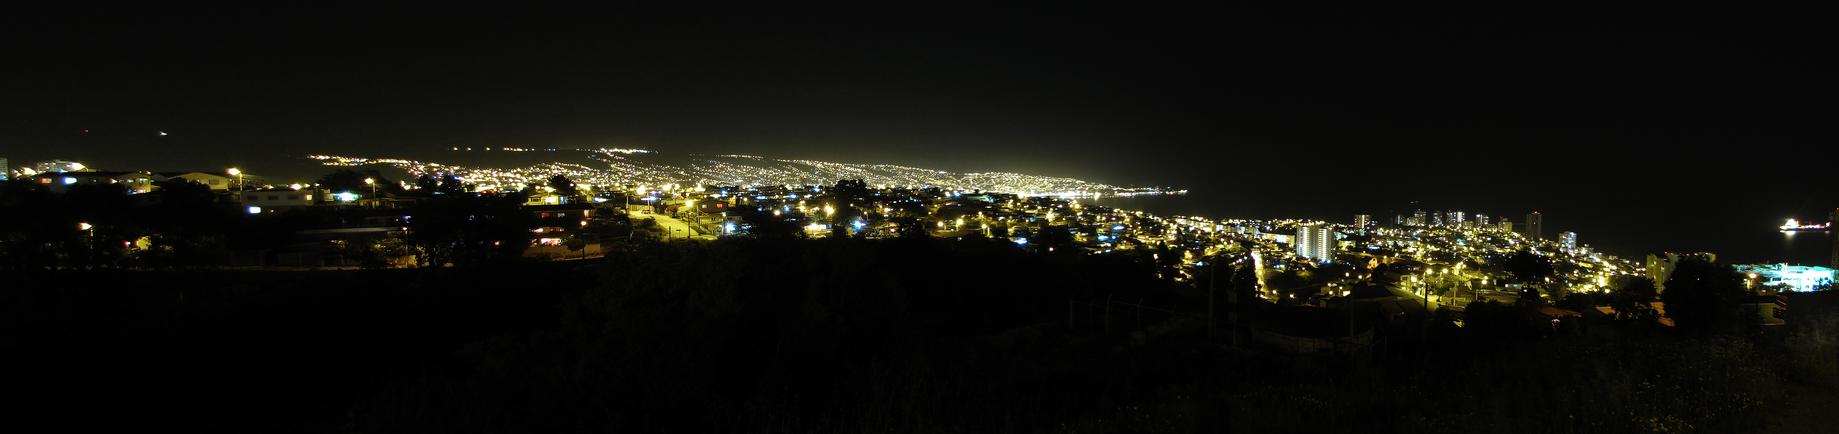 Valparaiso by DVHeld